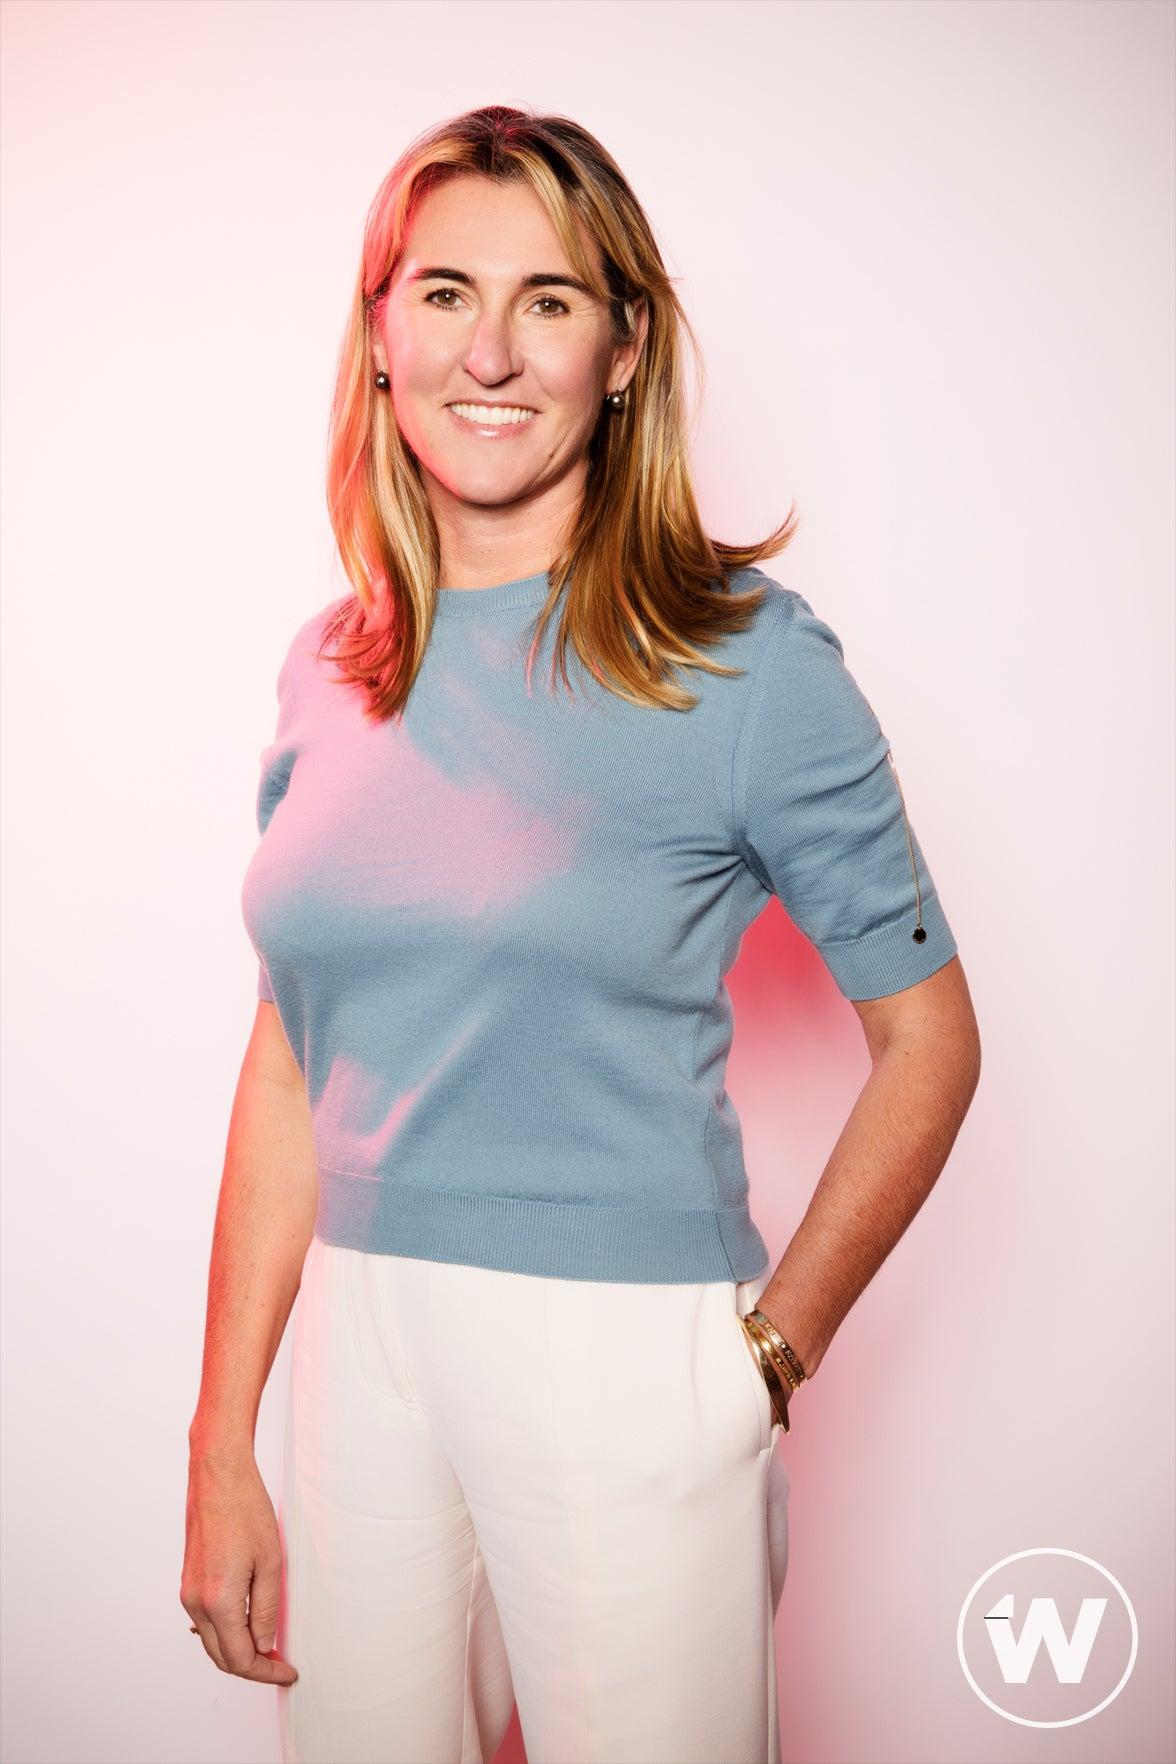 Nancy Dubuc, Power Women Summit